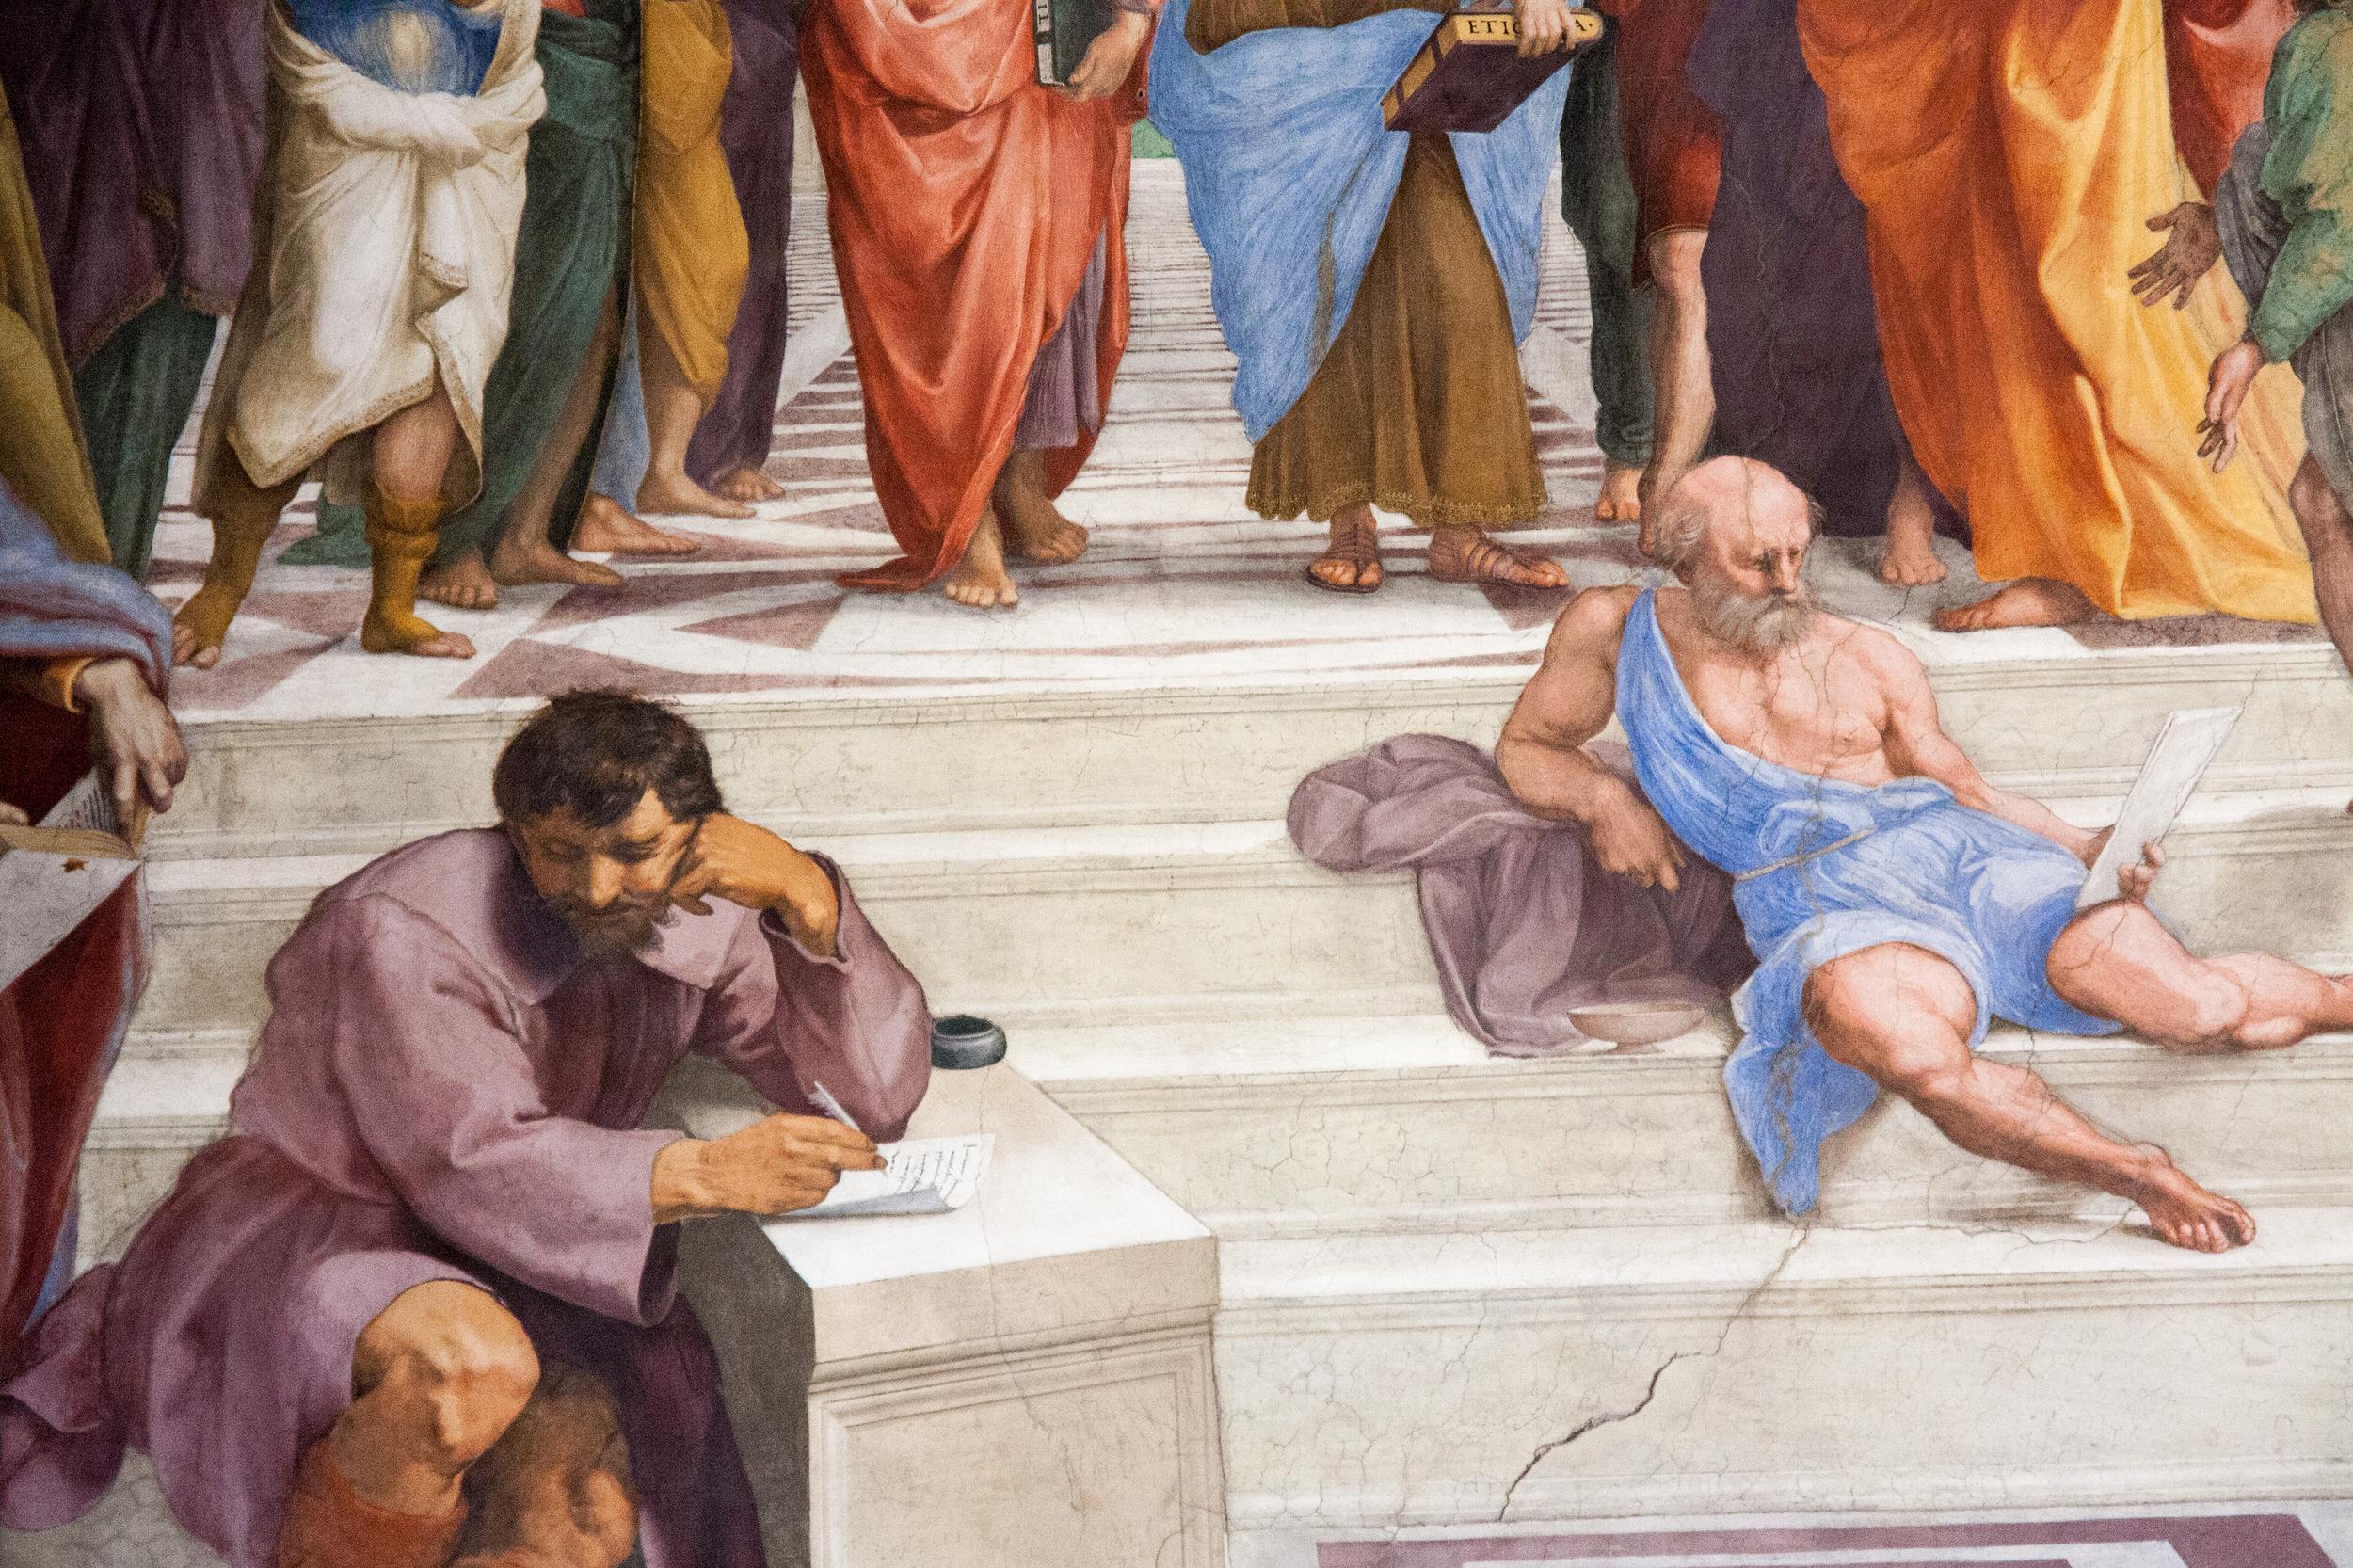 Michelangelo's portrait in  The School of Athens  (Raphael)